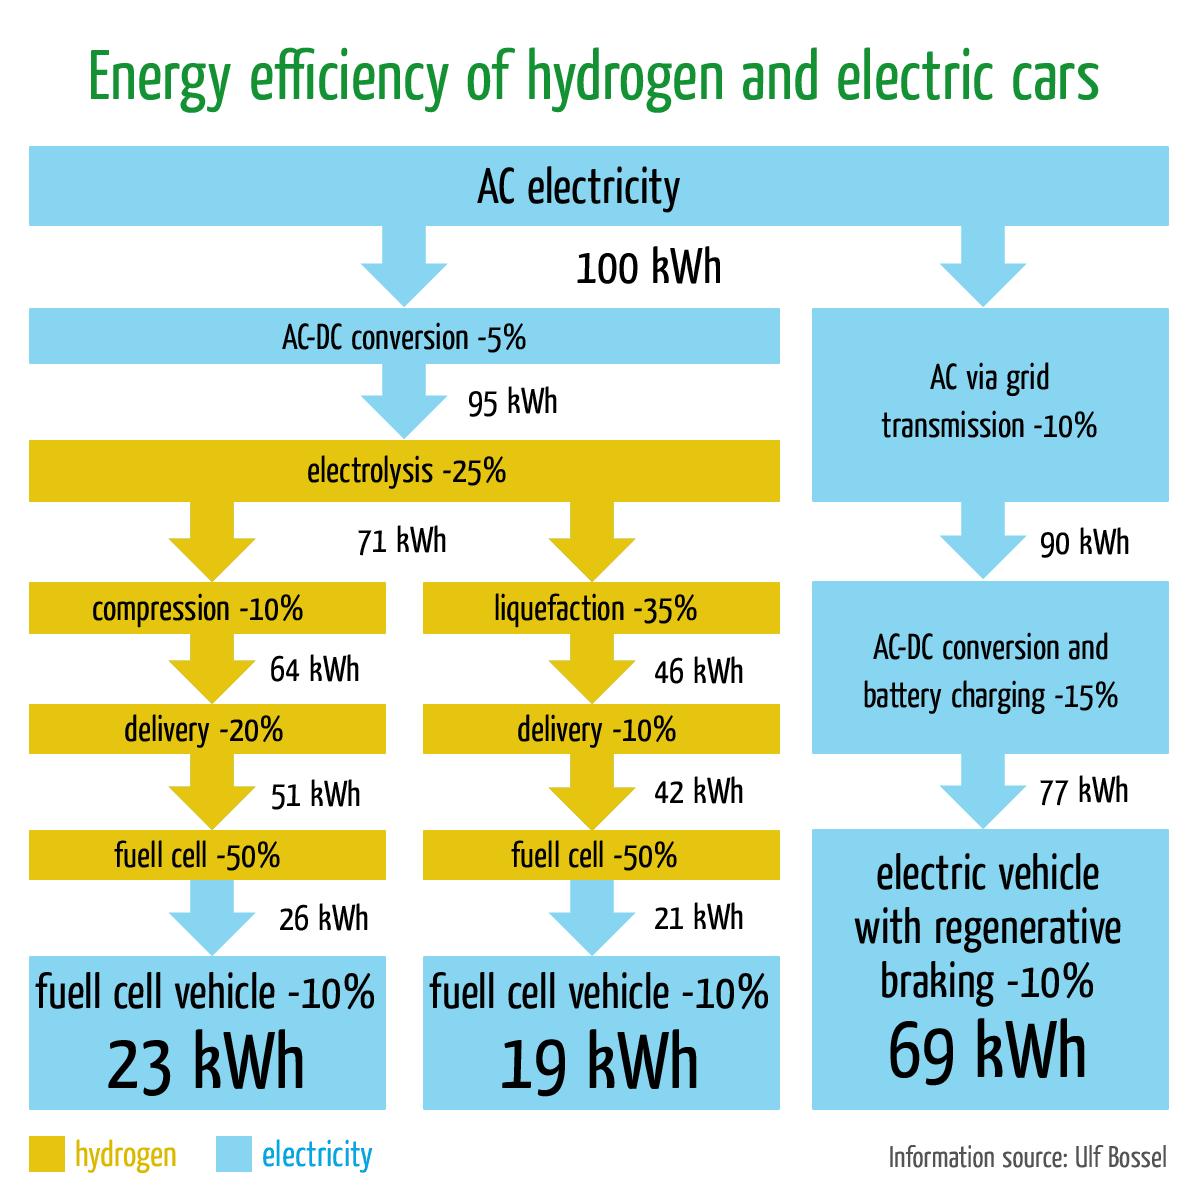 hydrogencar.png